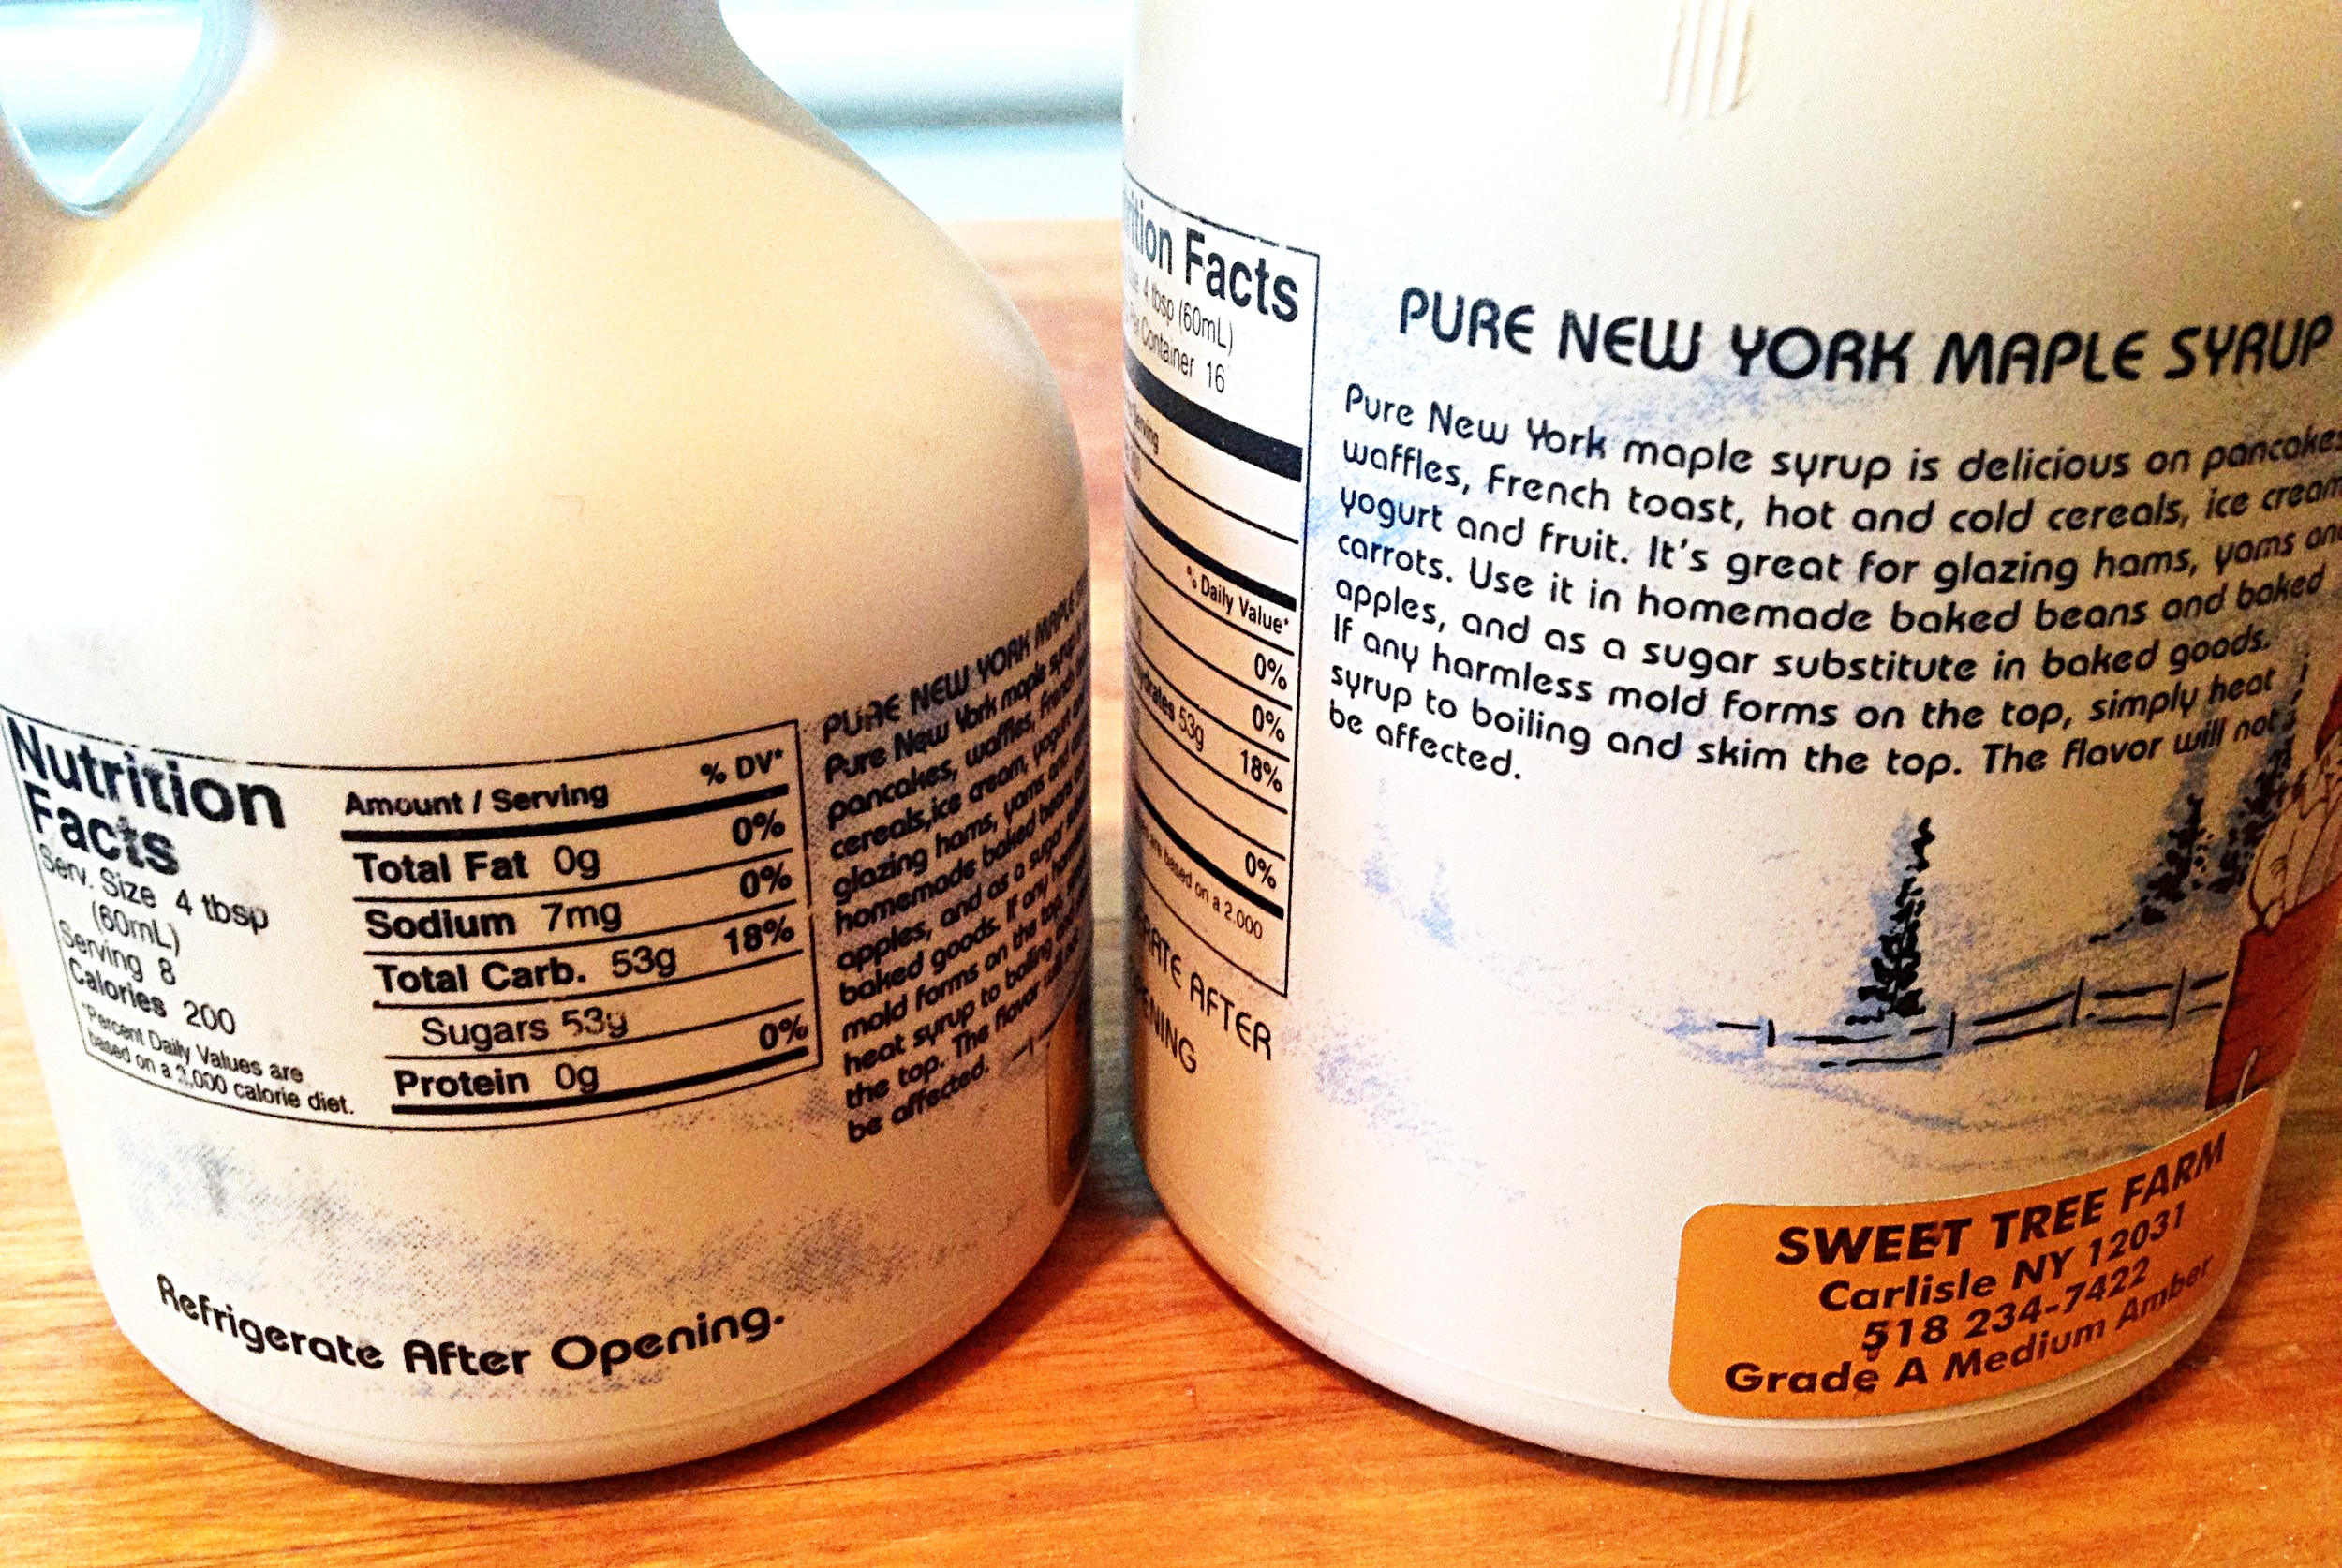 FarmEats maple syrup